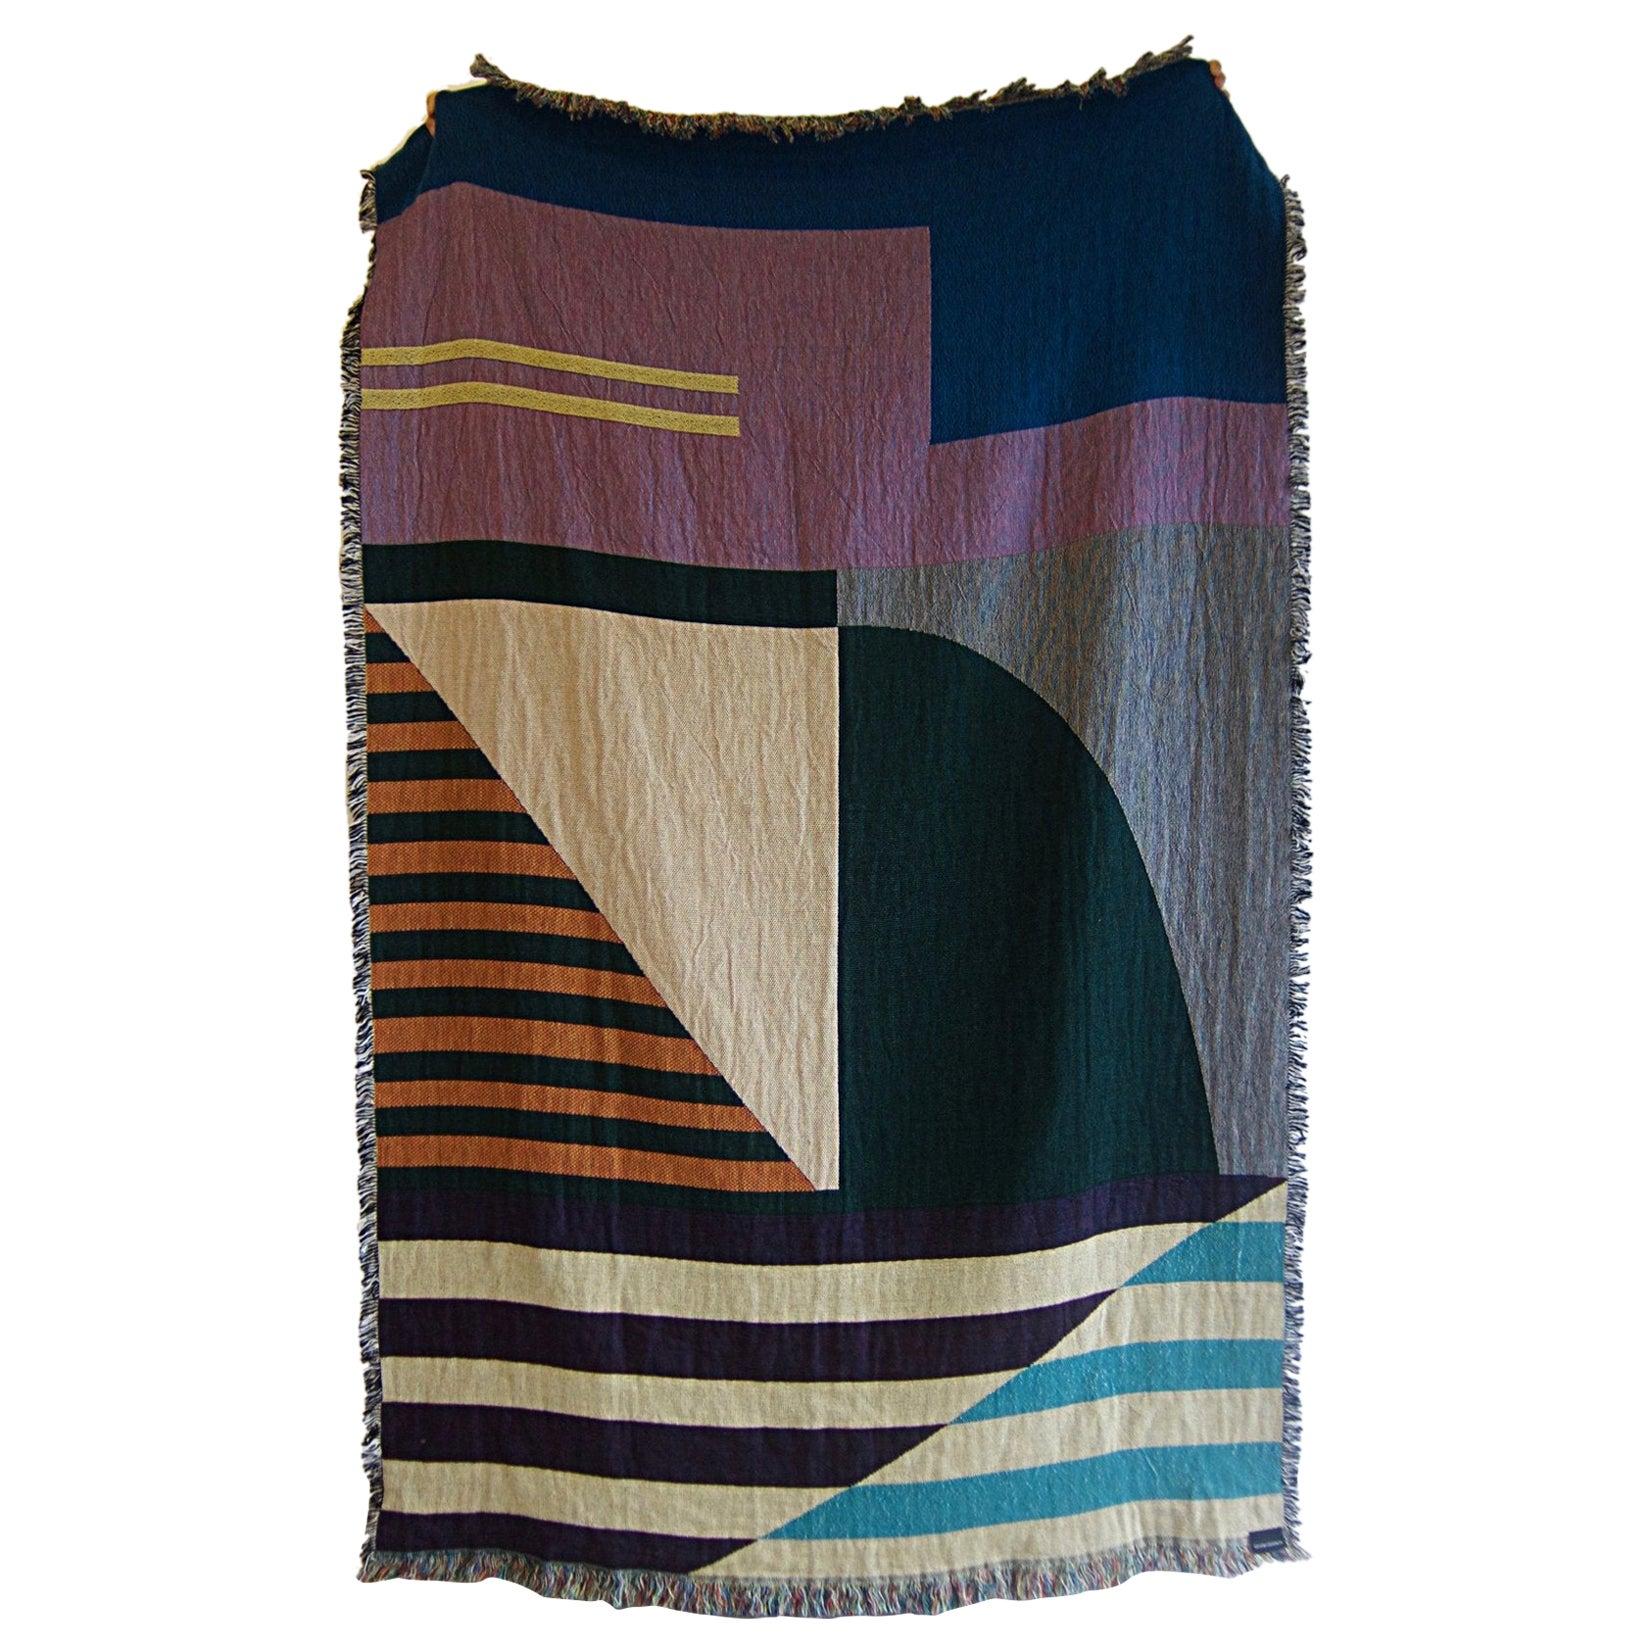 Geometric Woven Throw Blanket